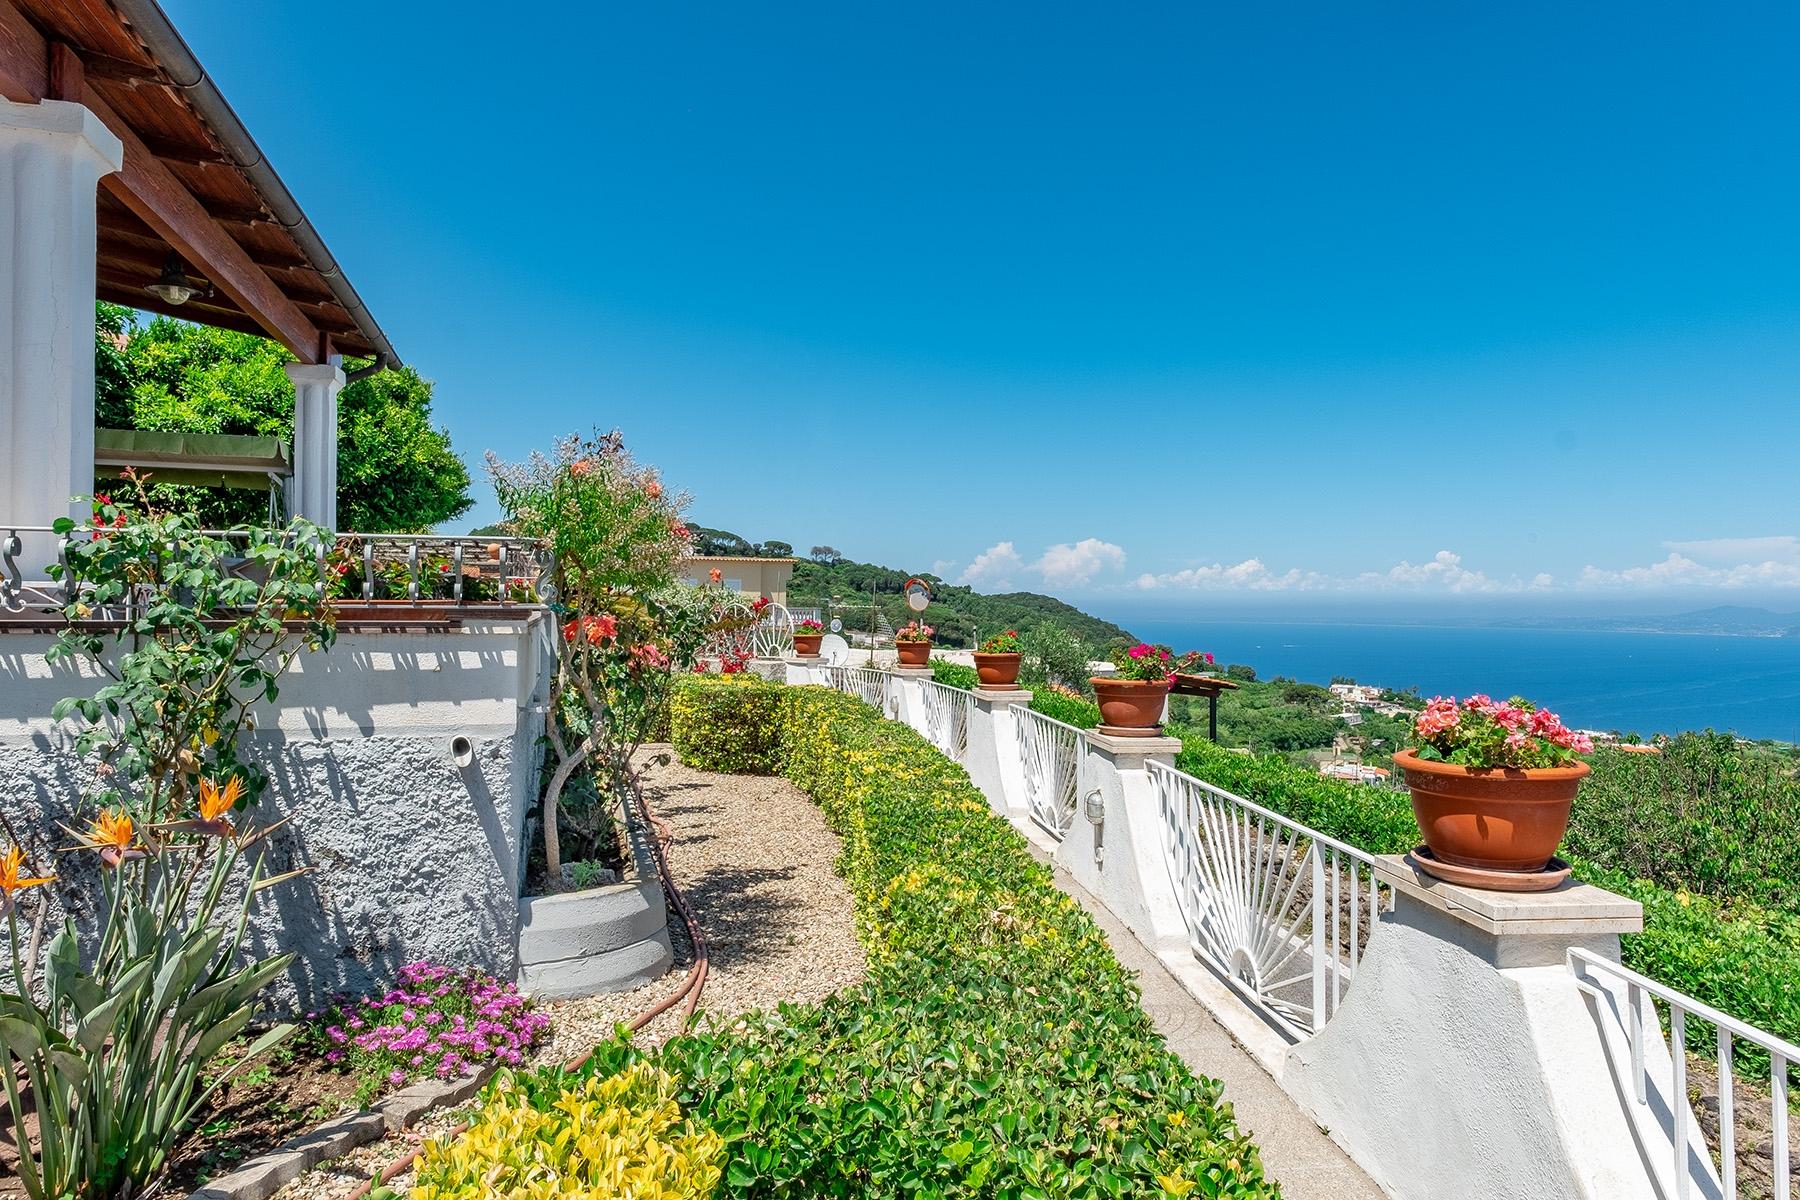 Villa in Vendita a Ischia: 5 locali, 138 mq - Foto 6